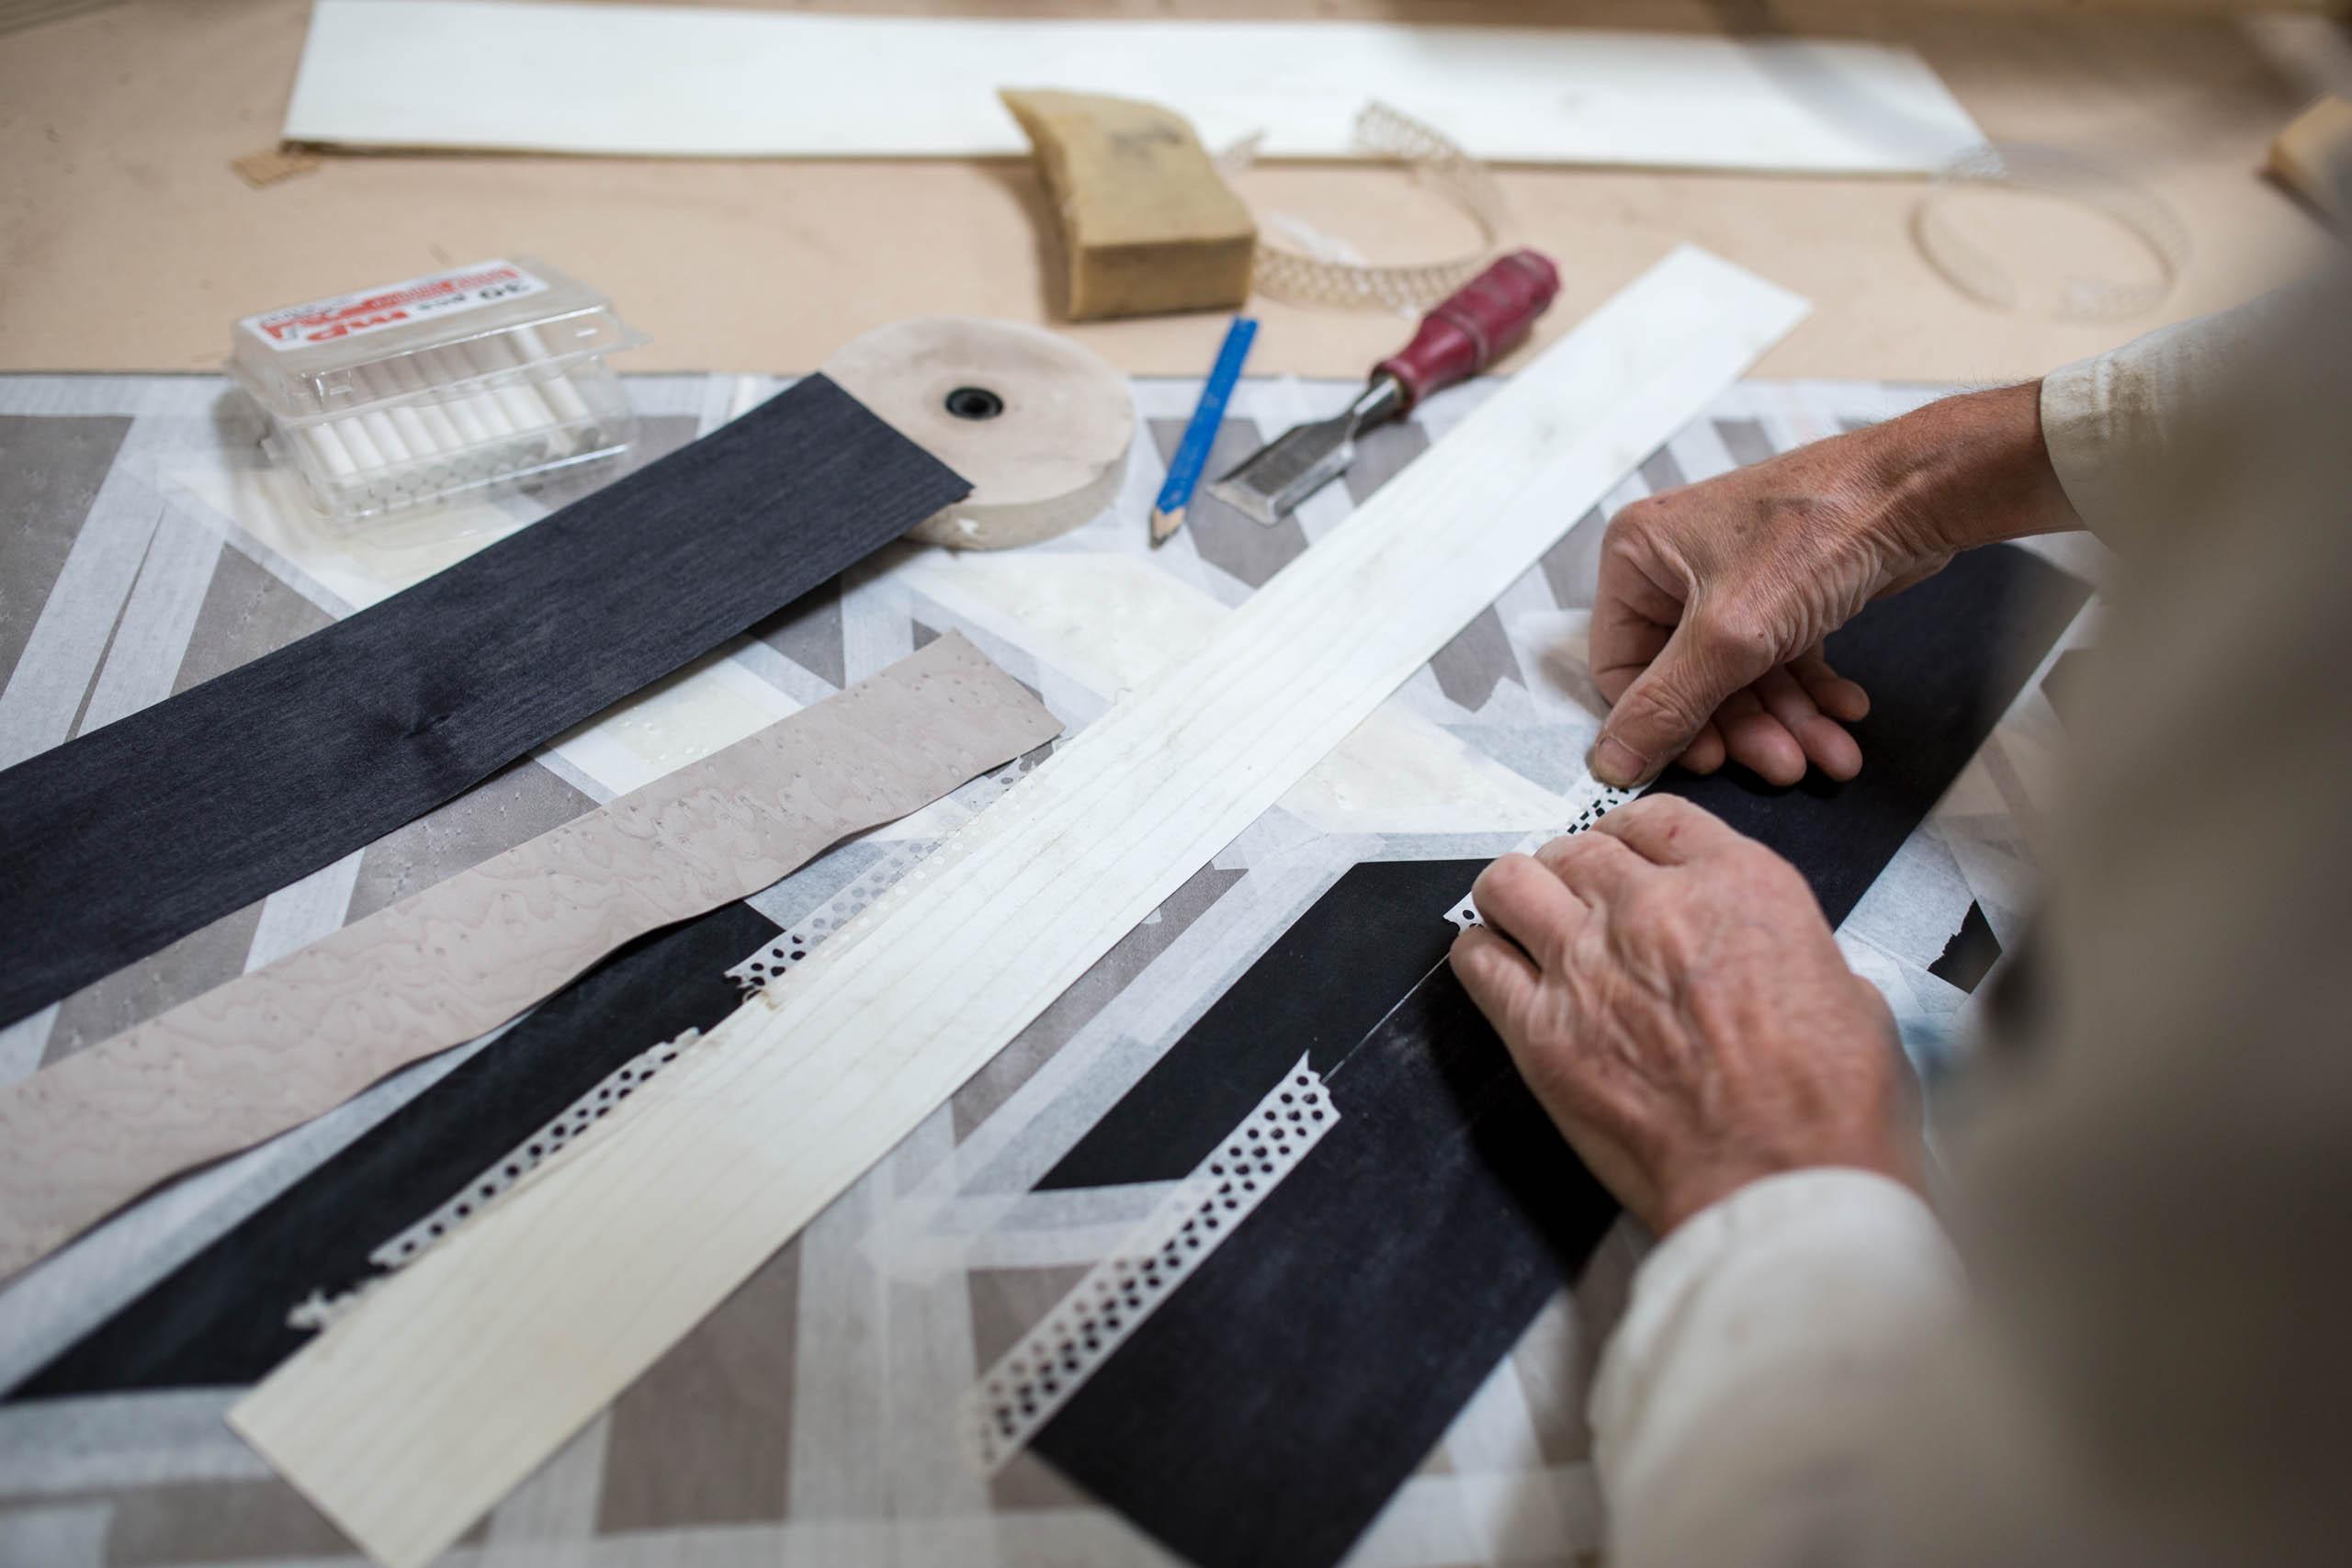 Wooden Handmade Artisanal Made in Italy Craftmanship